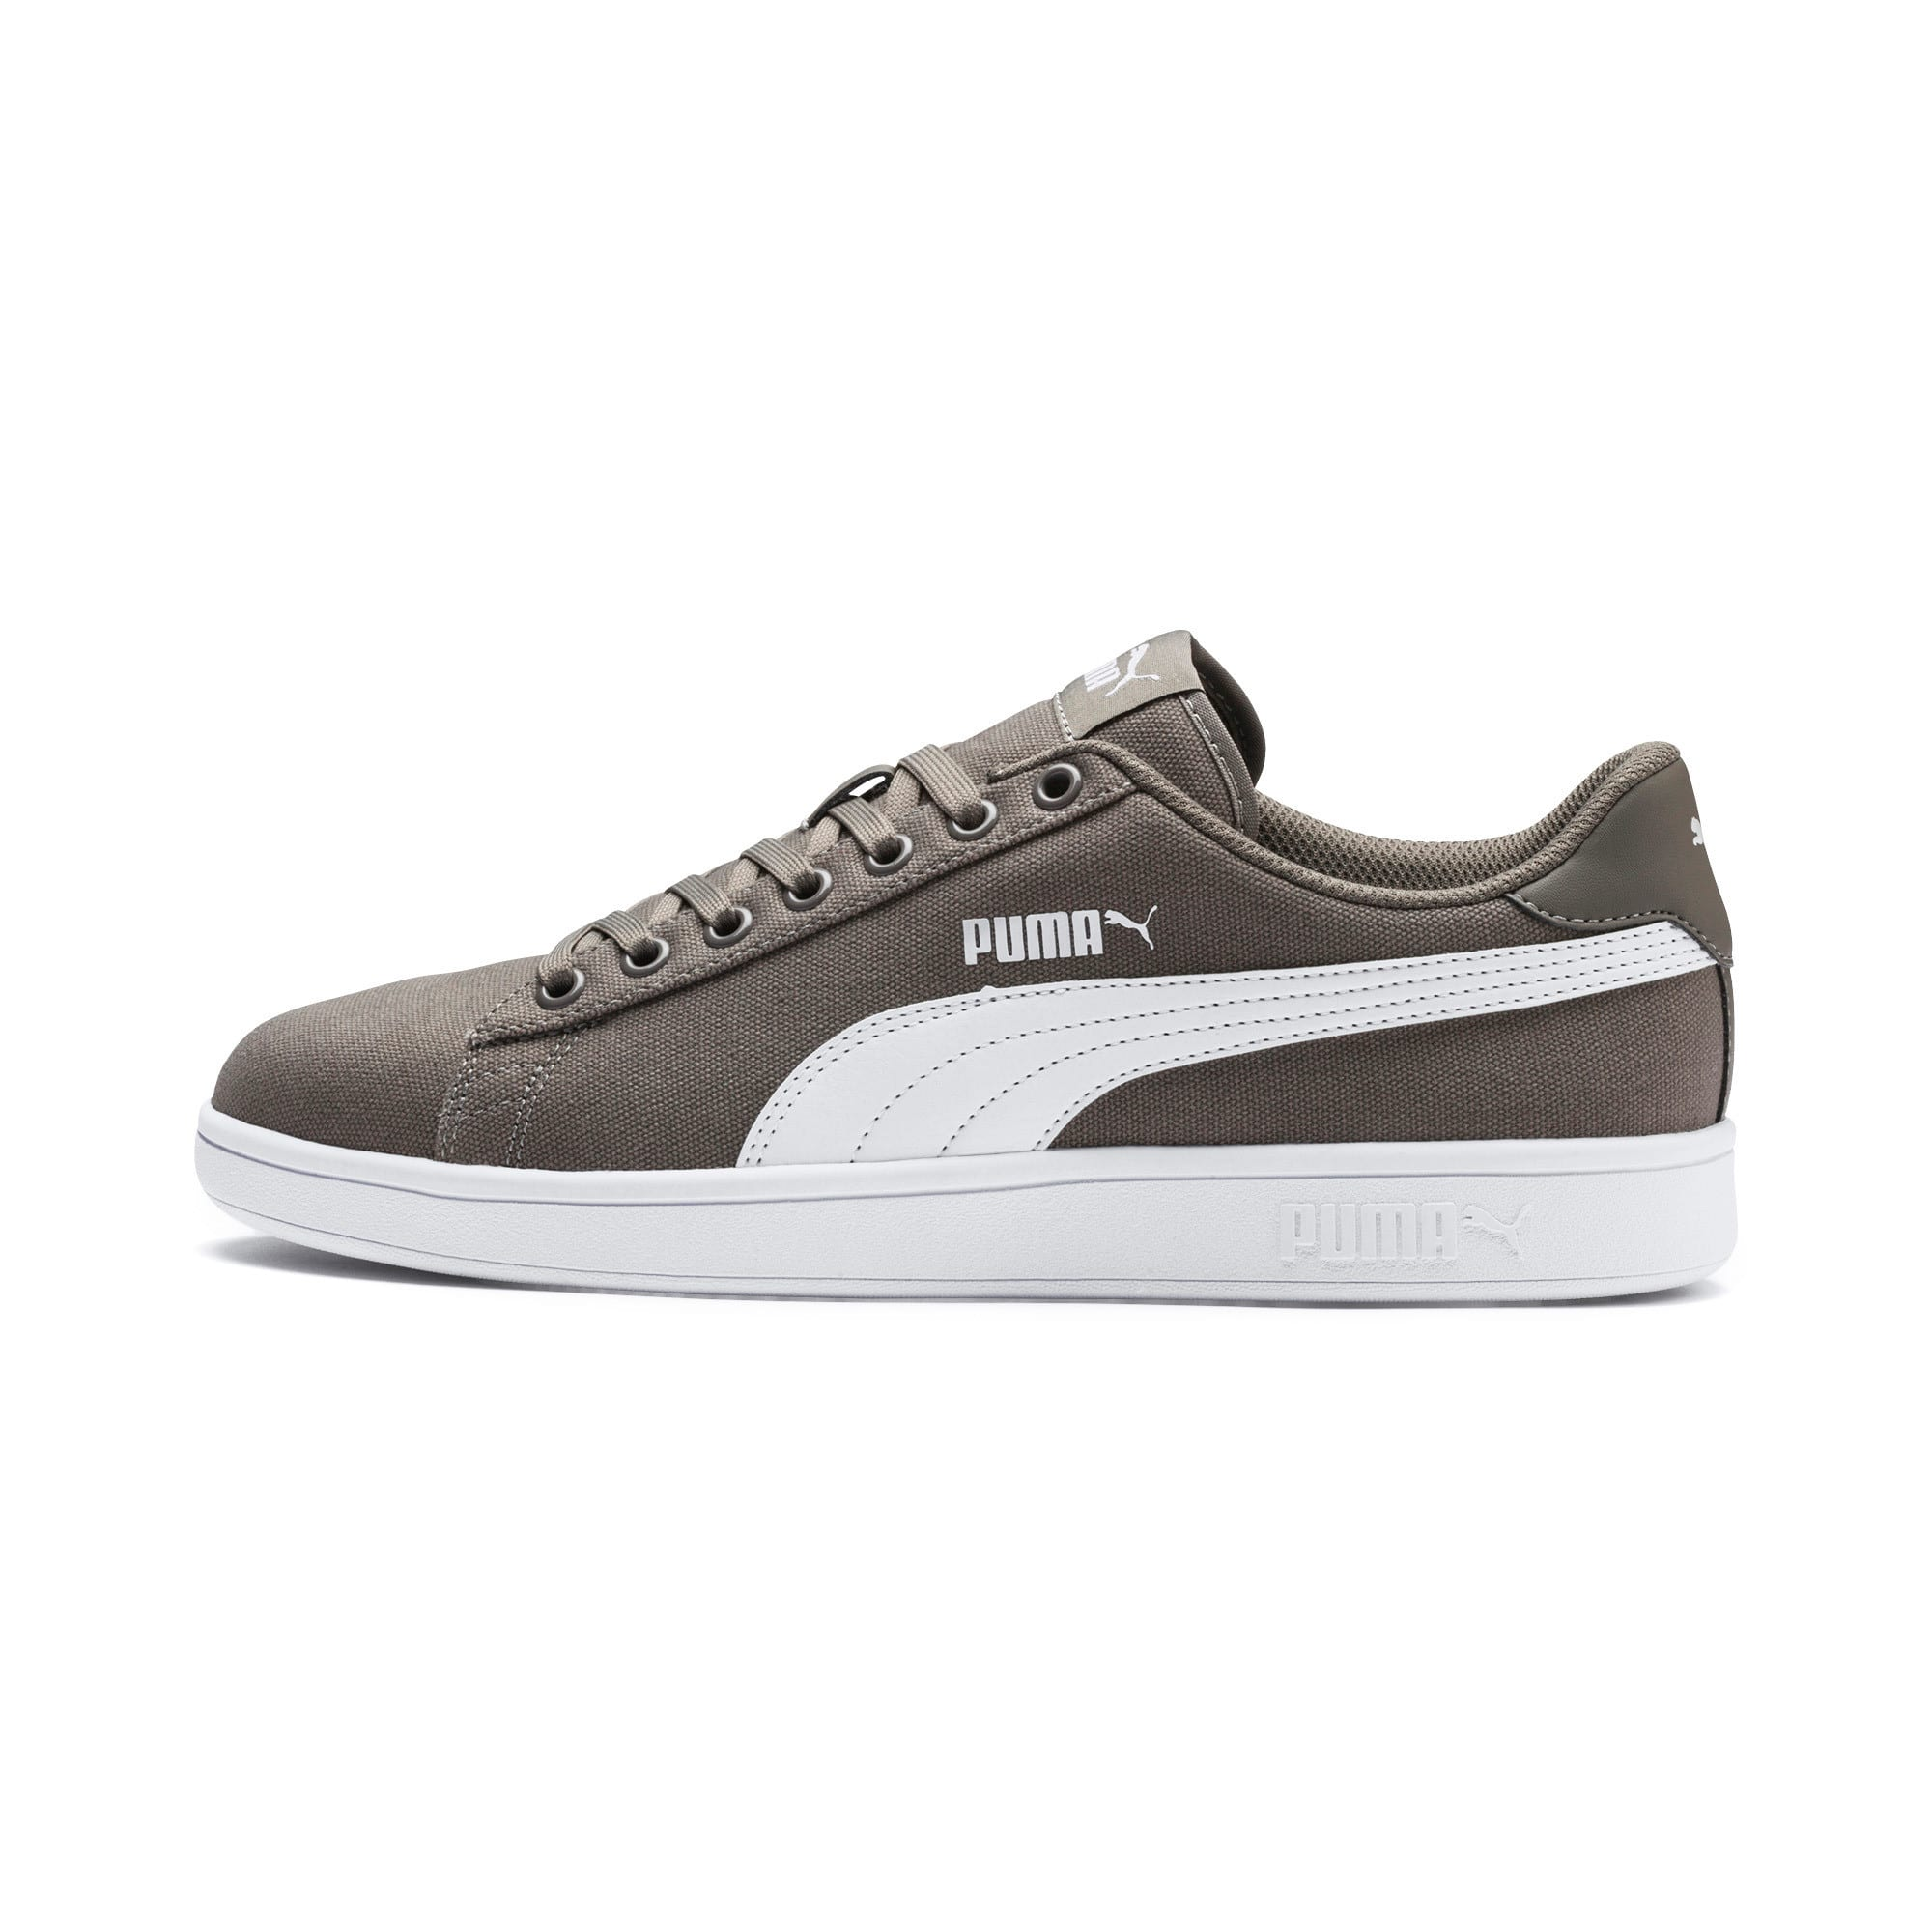 Thumbnail 1 of PUMA Smash v2 Canvas Sneakers, Charcoal Gray-Puma White, medium